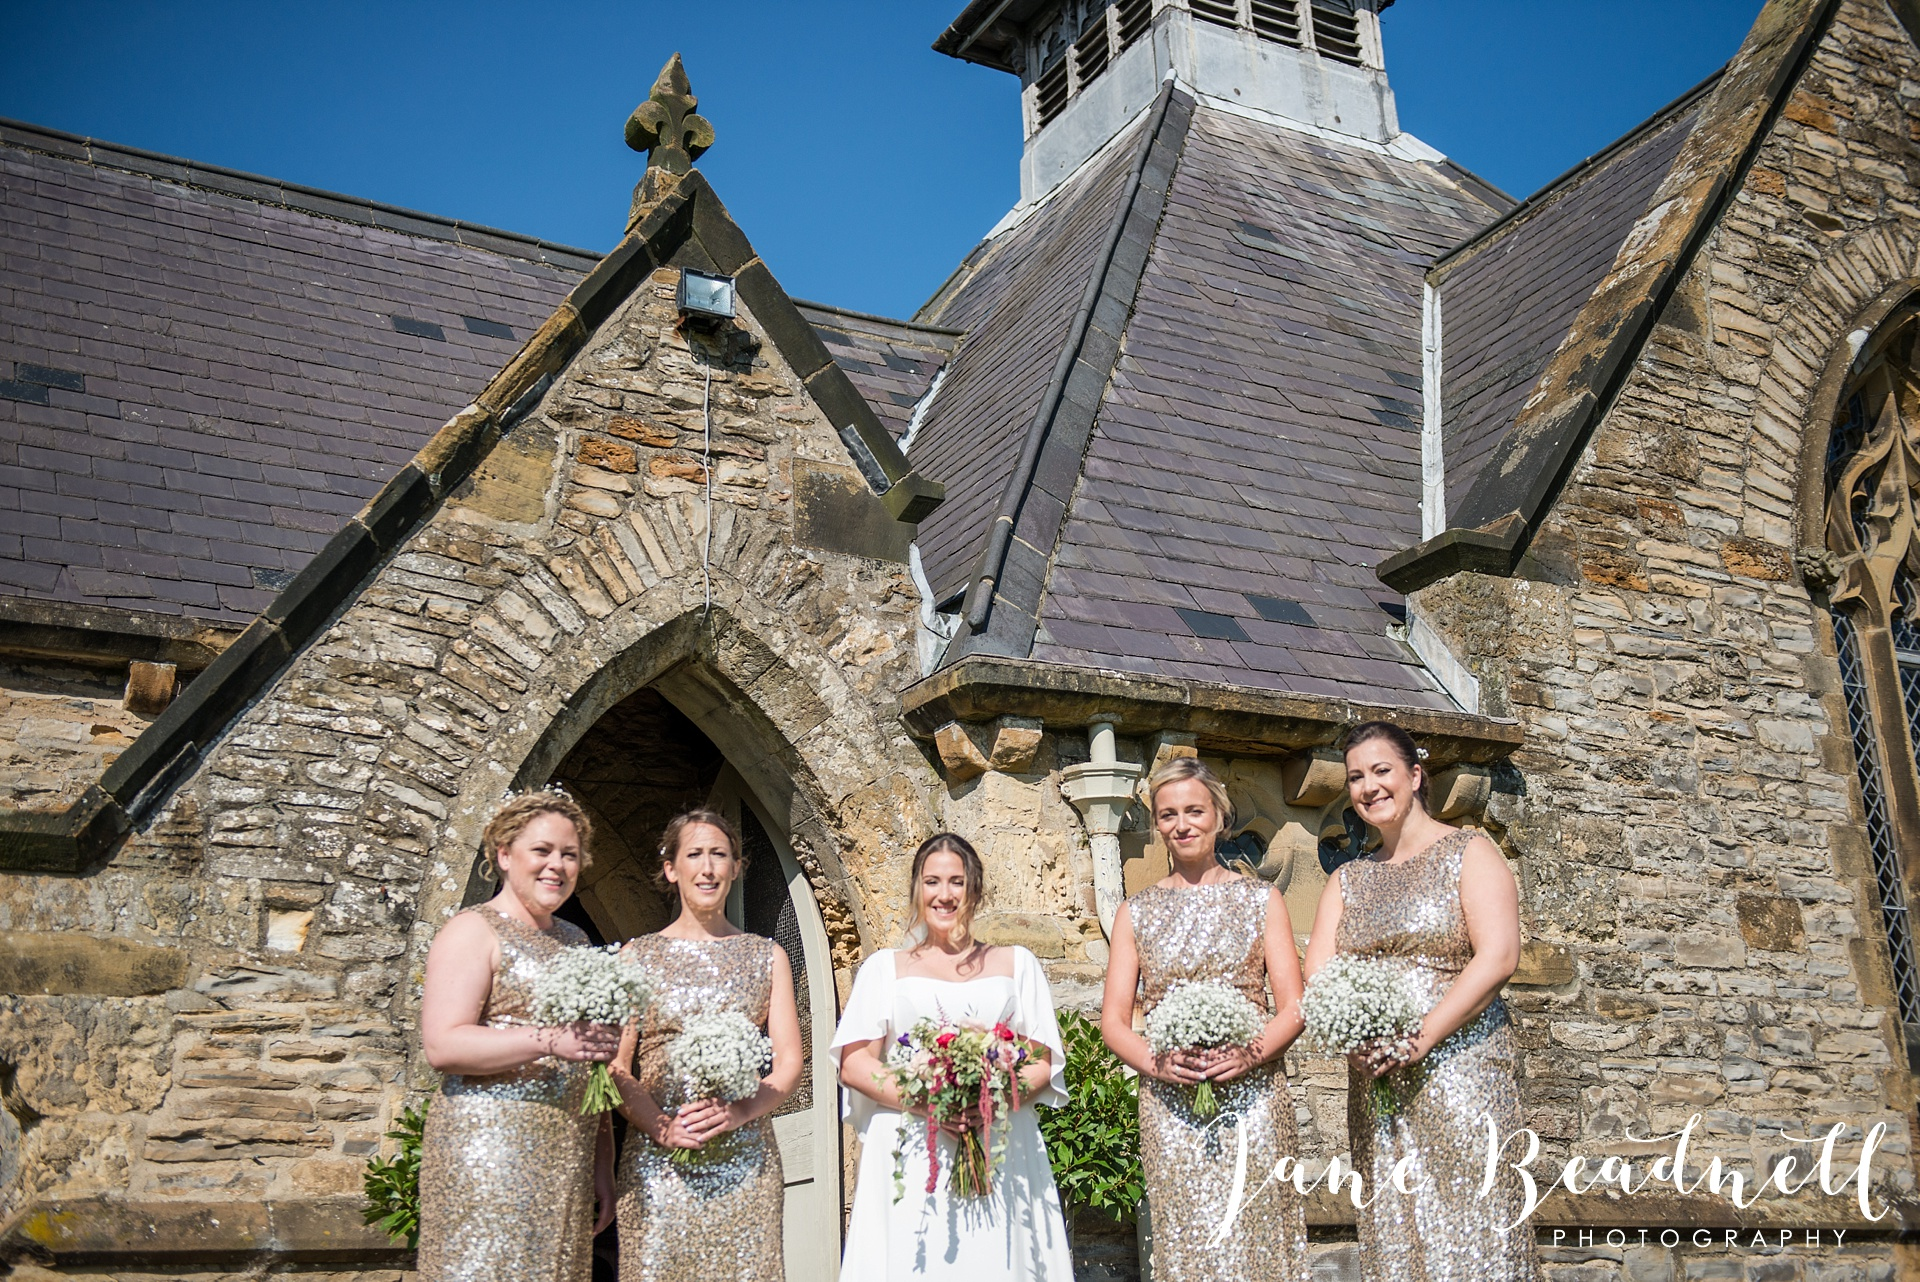 fine-art-wedding-photographer-jane-beadnell-yorkshire-wedding-photographer_0044